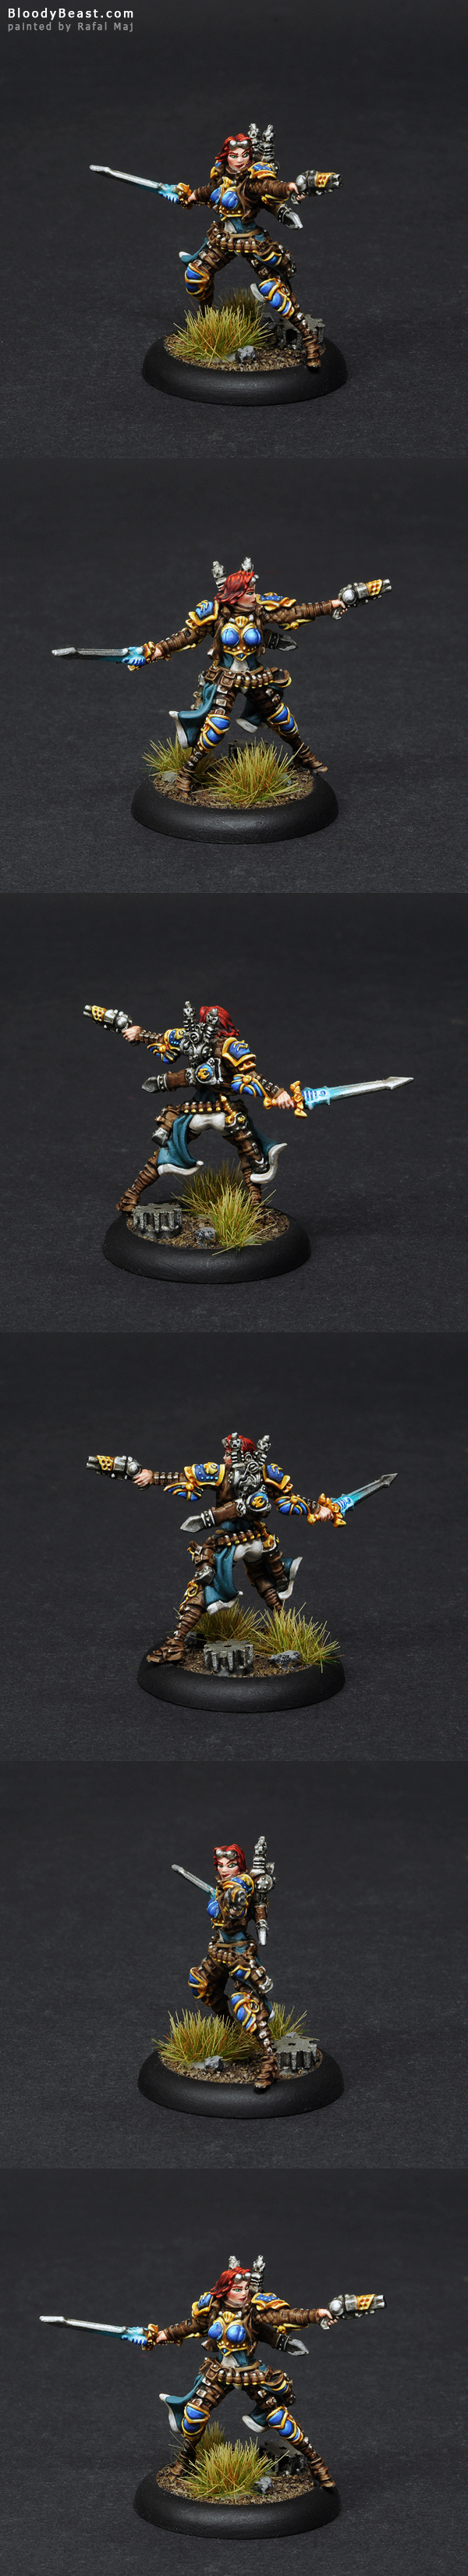 Cygnar Lieutenant Allison Jakes painted by Rafal Maj (BloodyBeast.com)